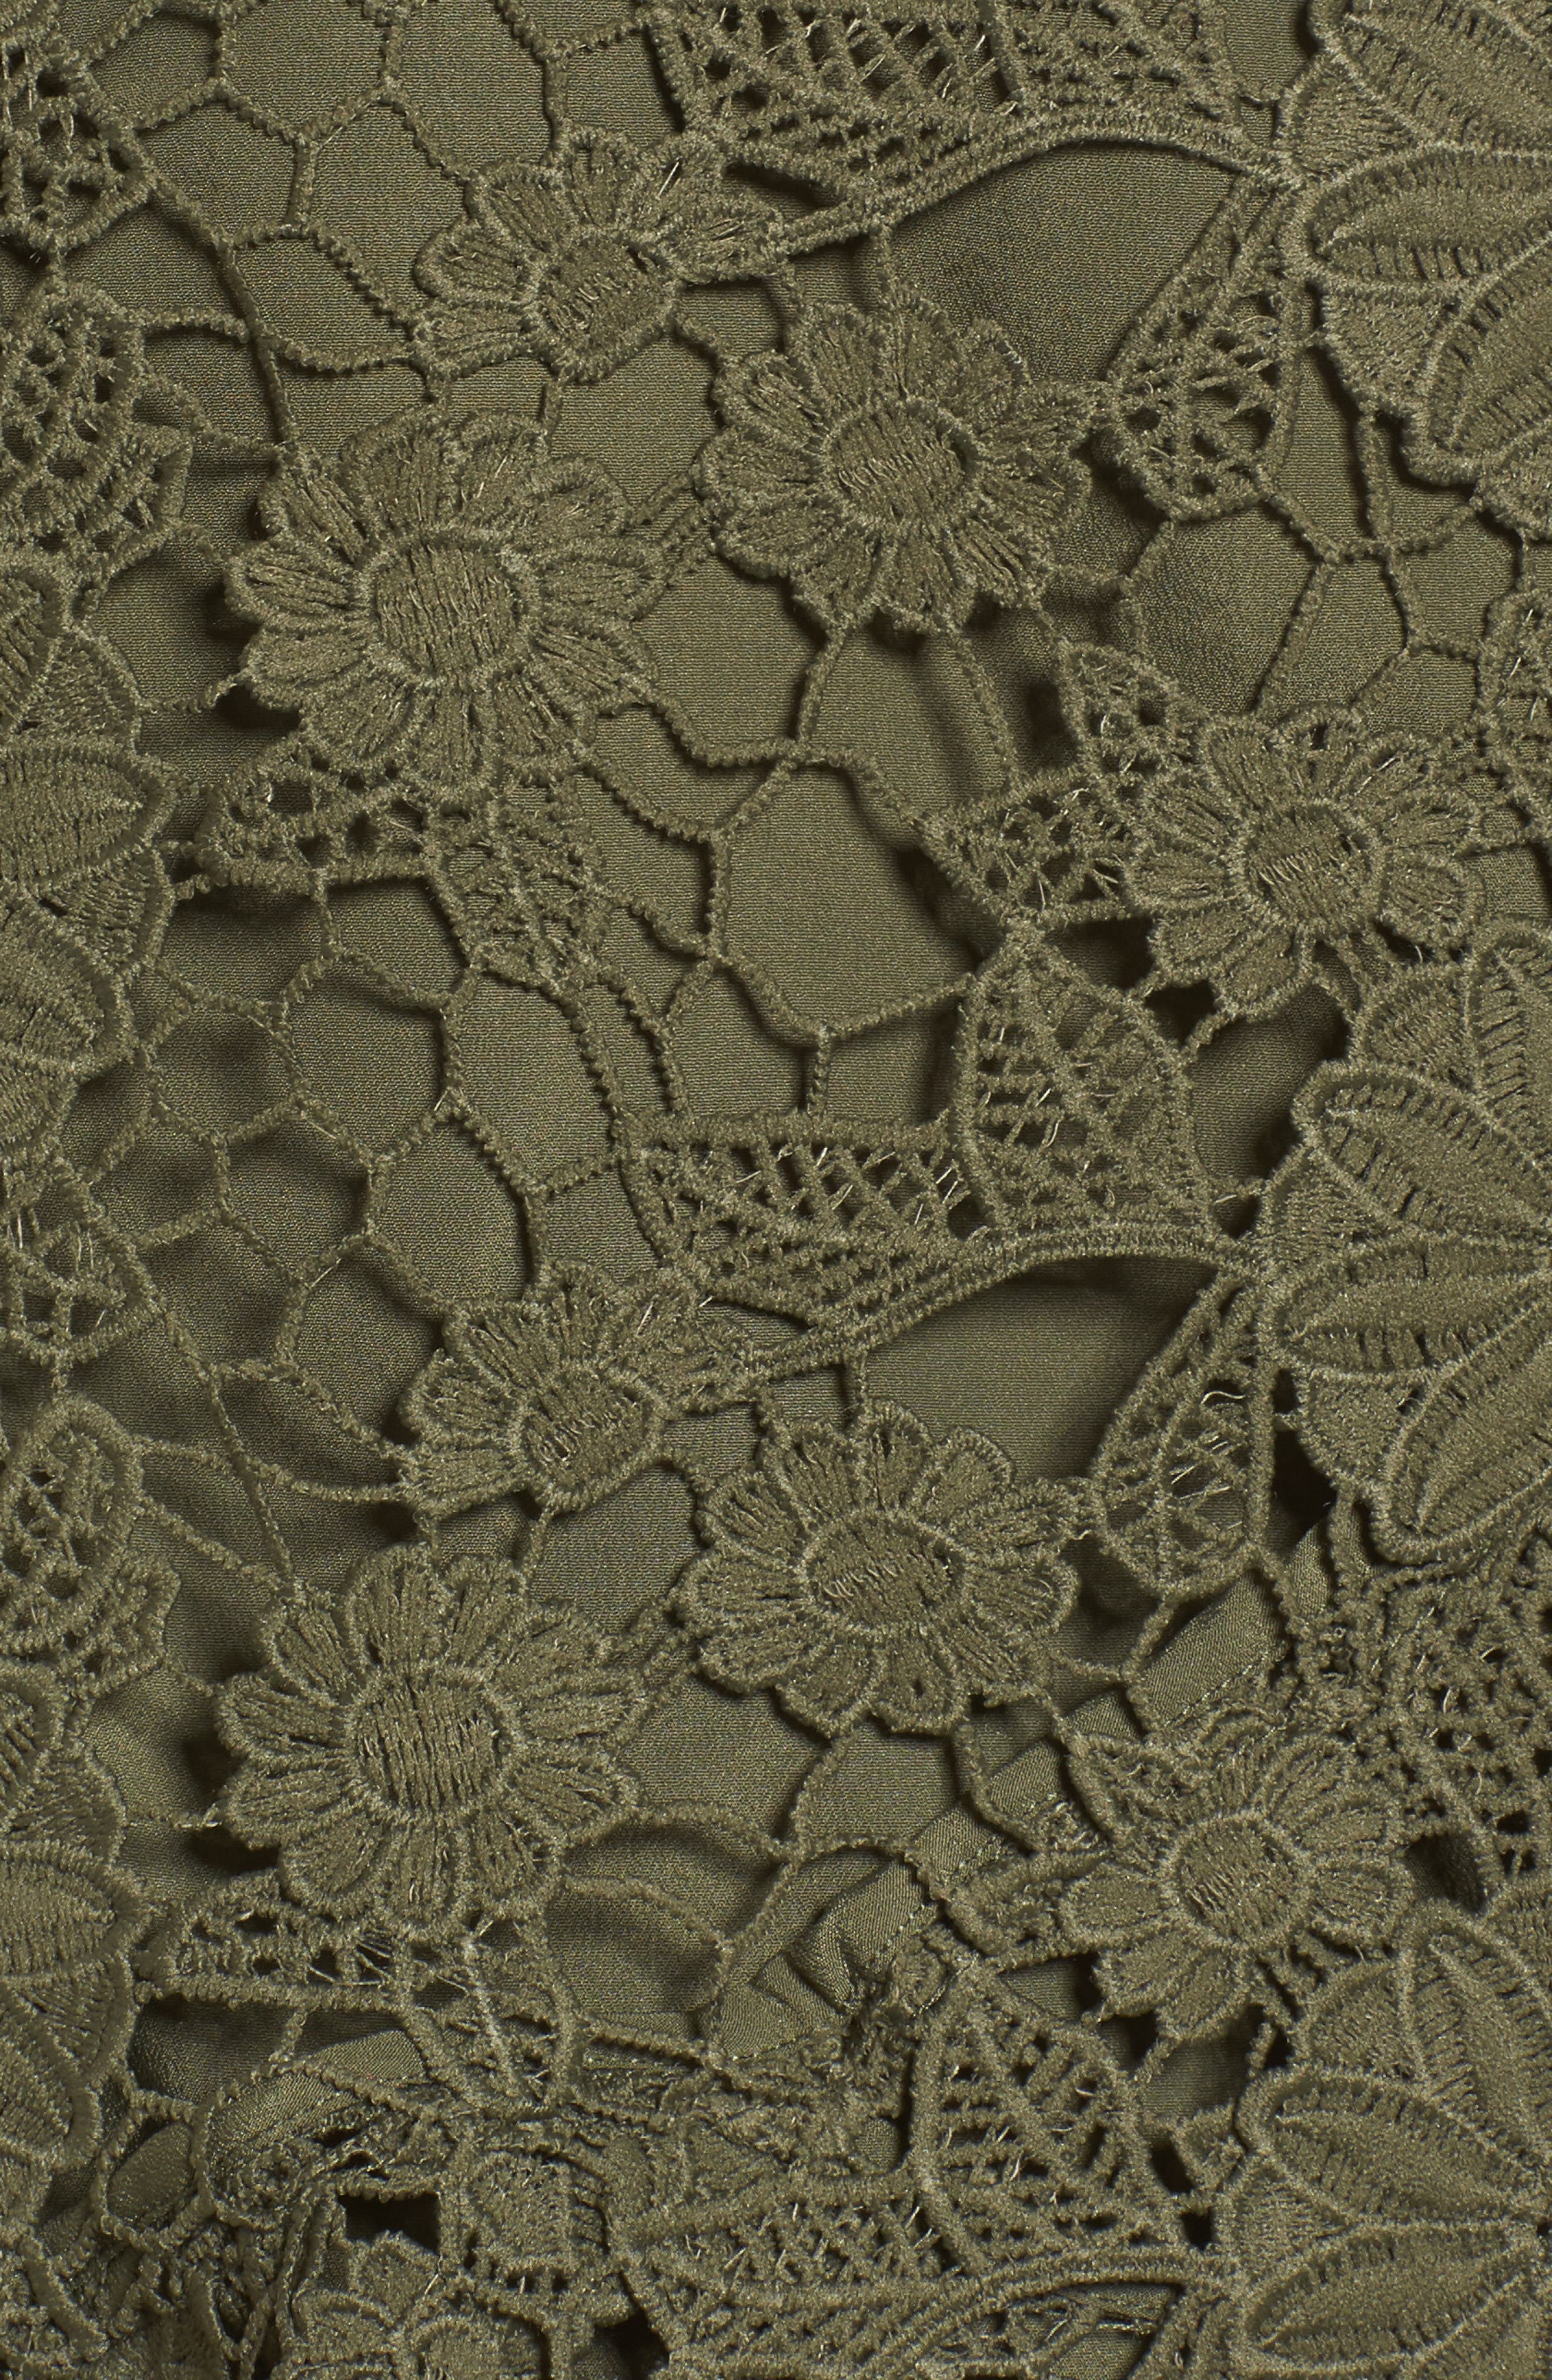 Frameless Lace Sheath Dress,                             Alternate thumbnail 5, color,                             300